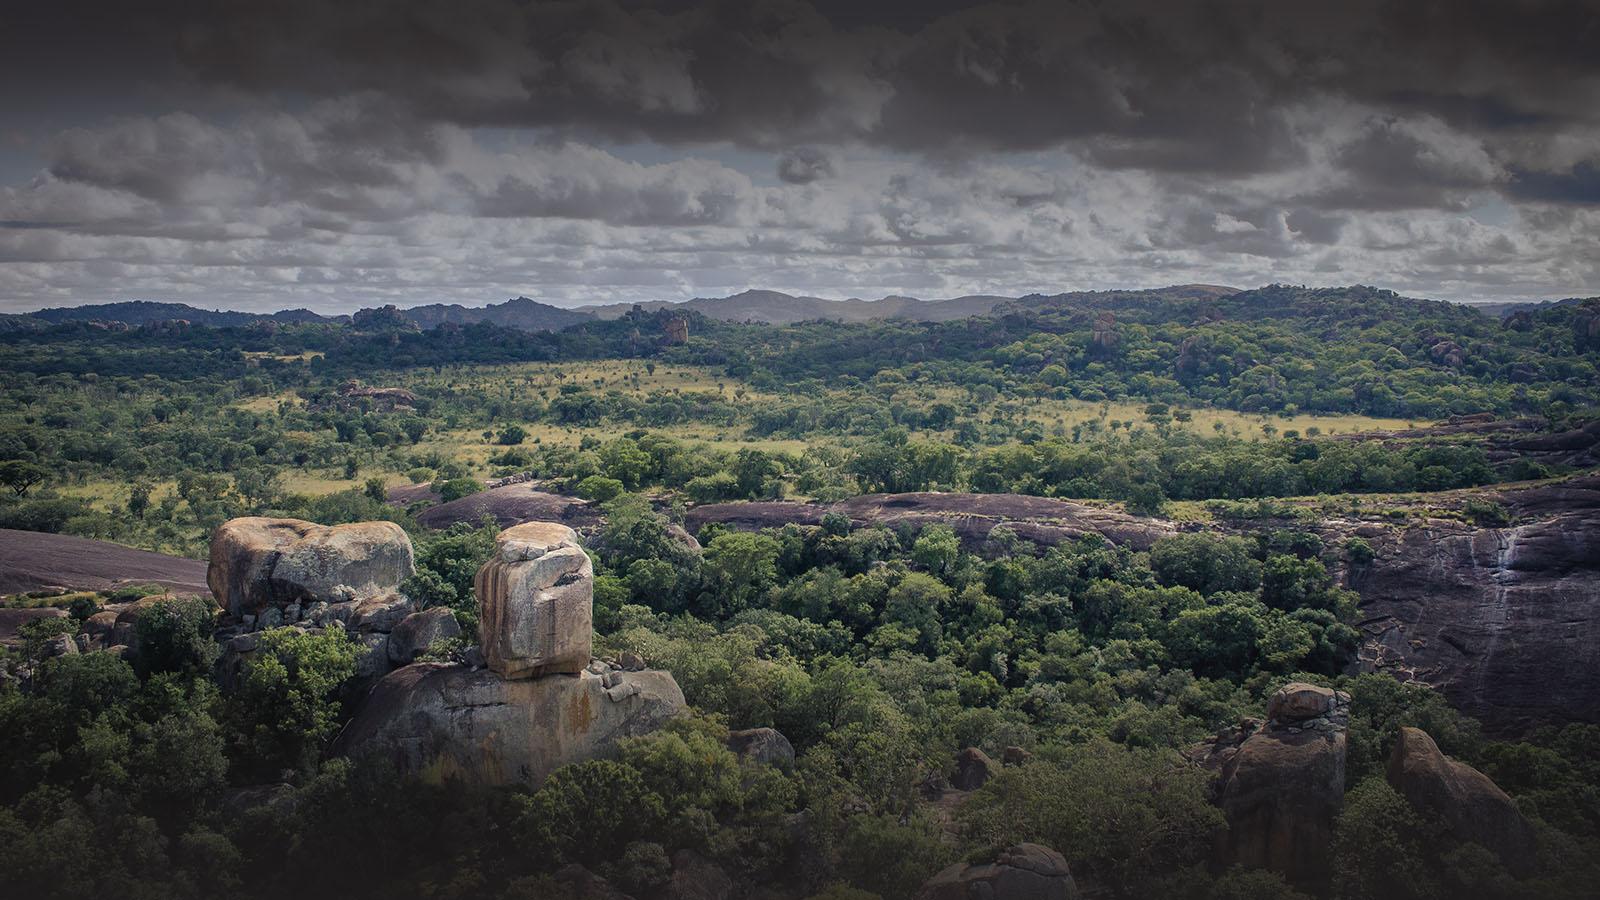 big cave camp matobo-hills-national-park-zimbabwe-landscapes